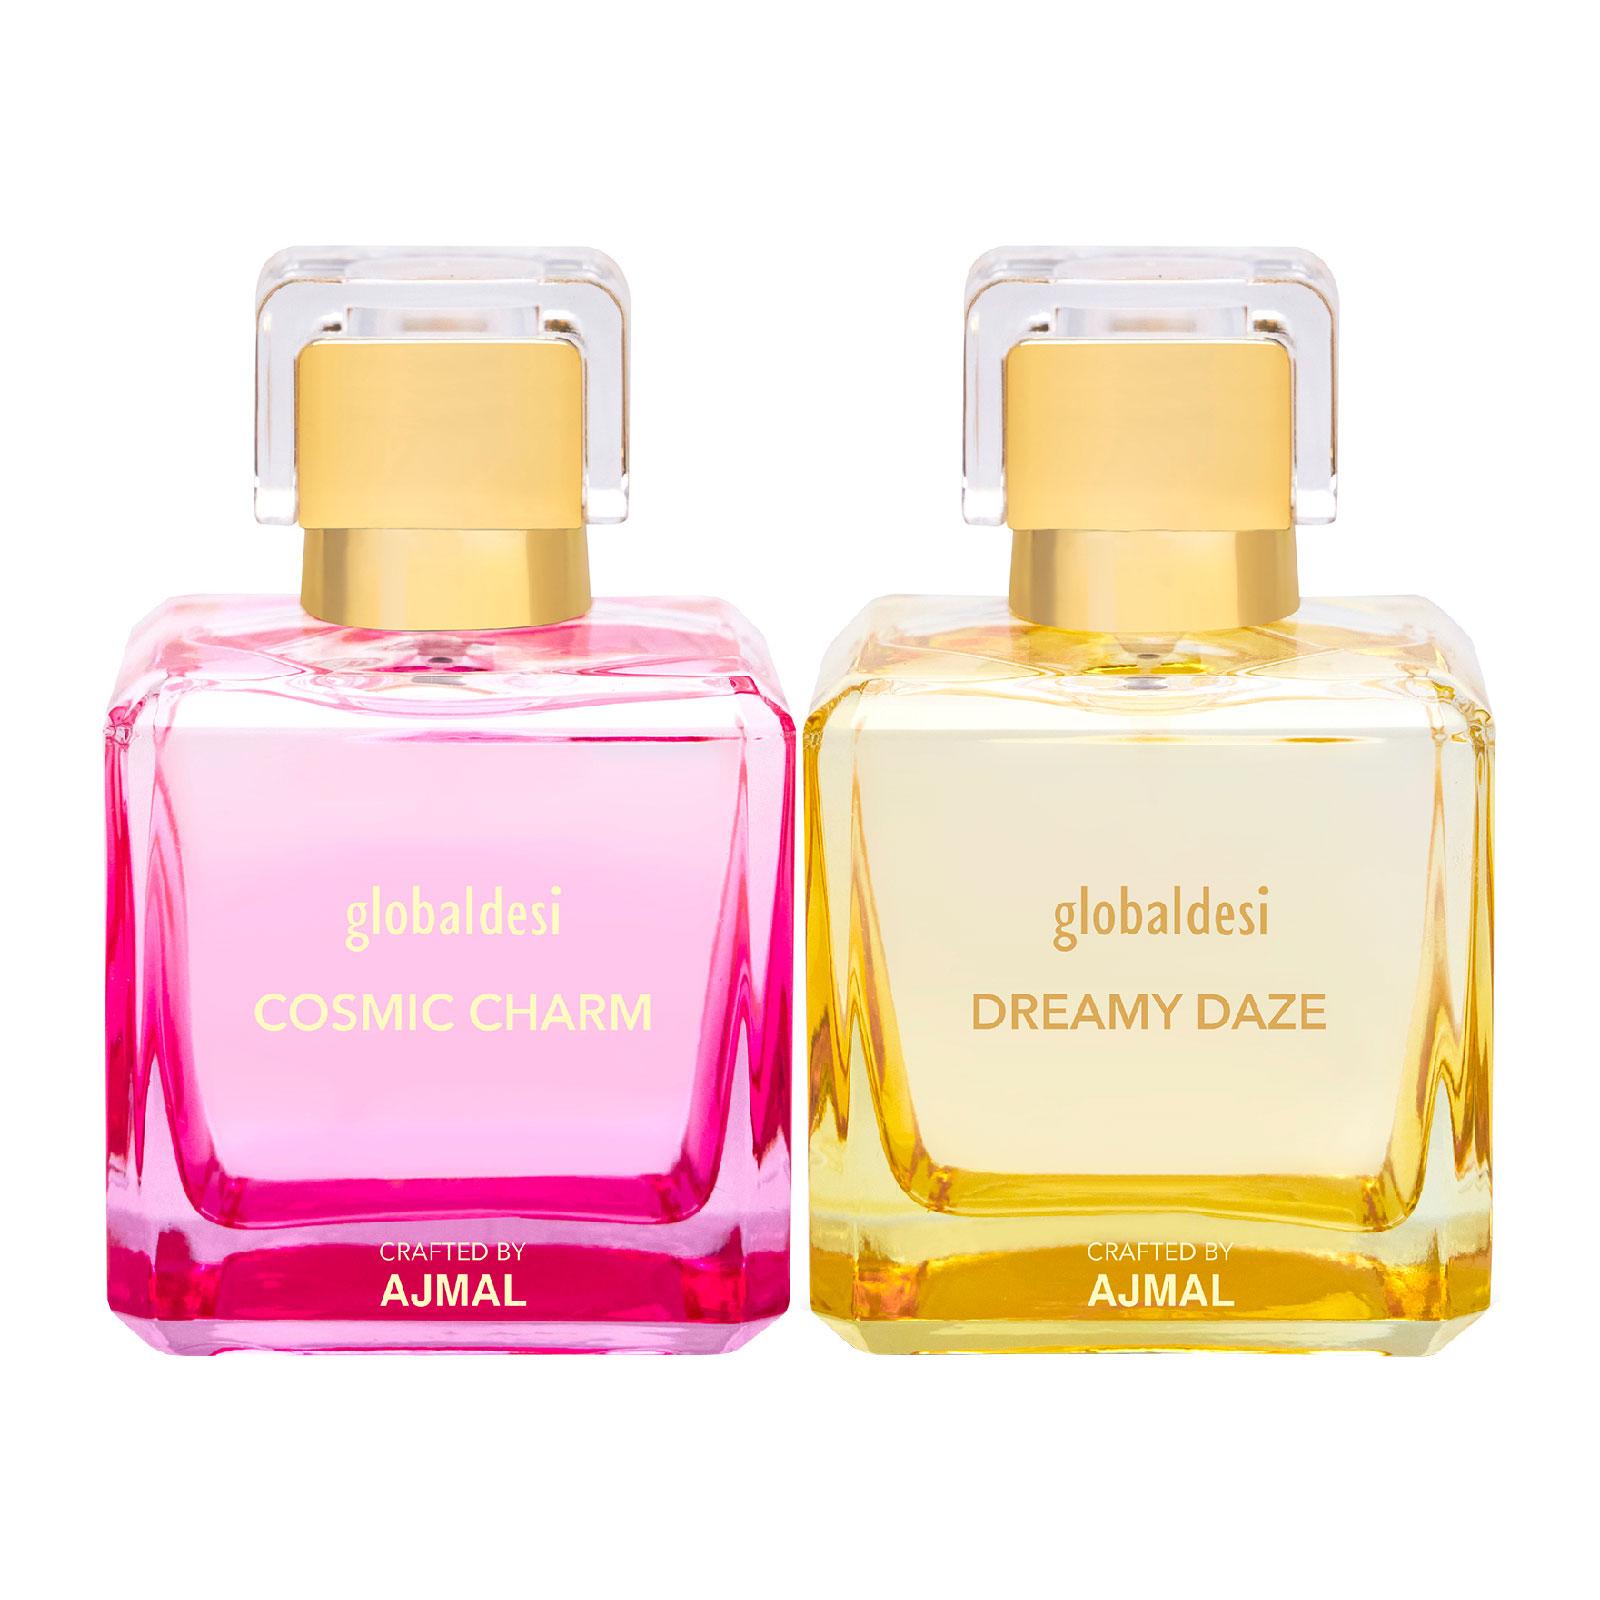 Global Desi Crafted By Ajmal | Global Desi Cosmic Charm & Dreamy Daze Pack of 2 Eau De Parfum 50ML for Women Crafted by Ajmal + 2 Parfum Testers